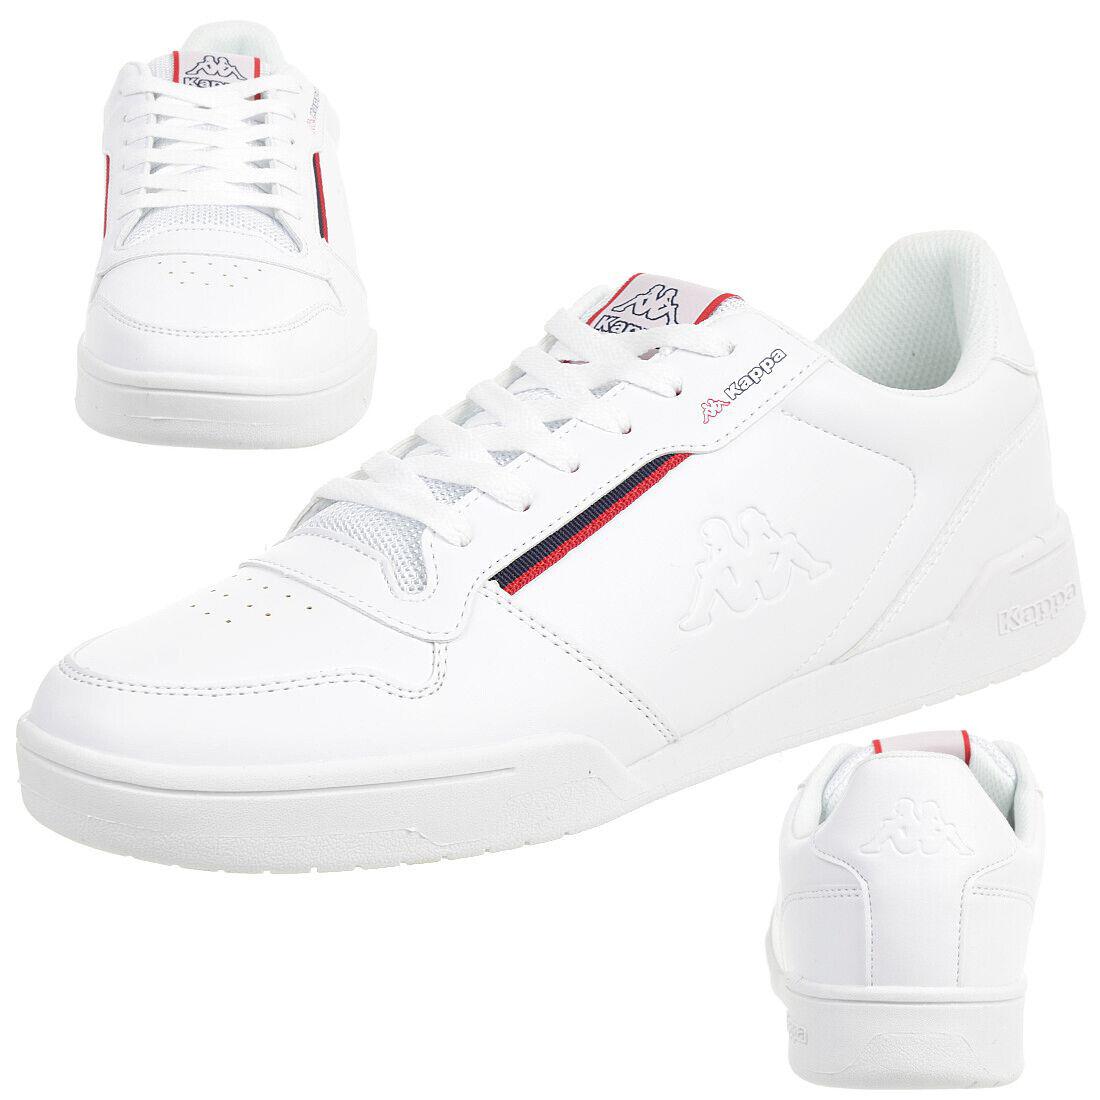 Kappa MARABU Sneaker Unisex Turnschuh 242765 Weiß